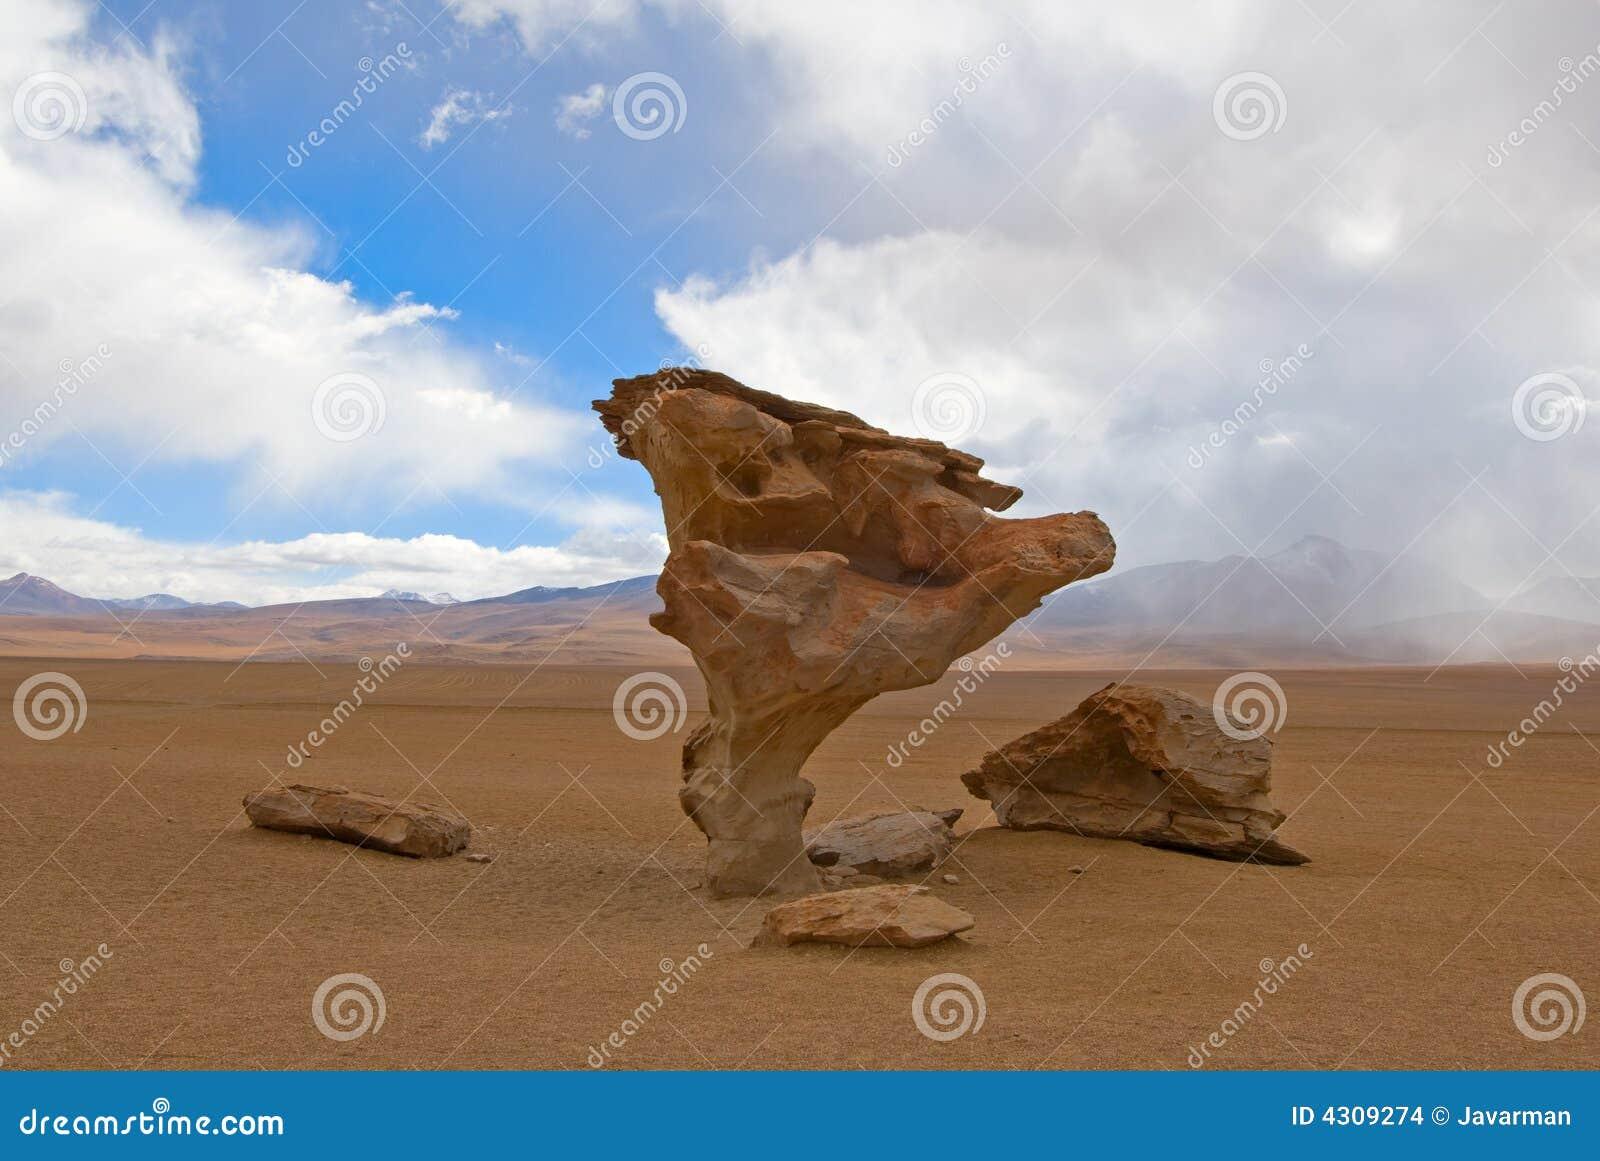 Arbol de piedra, árvore de pedra